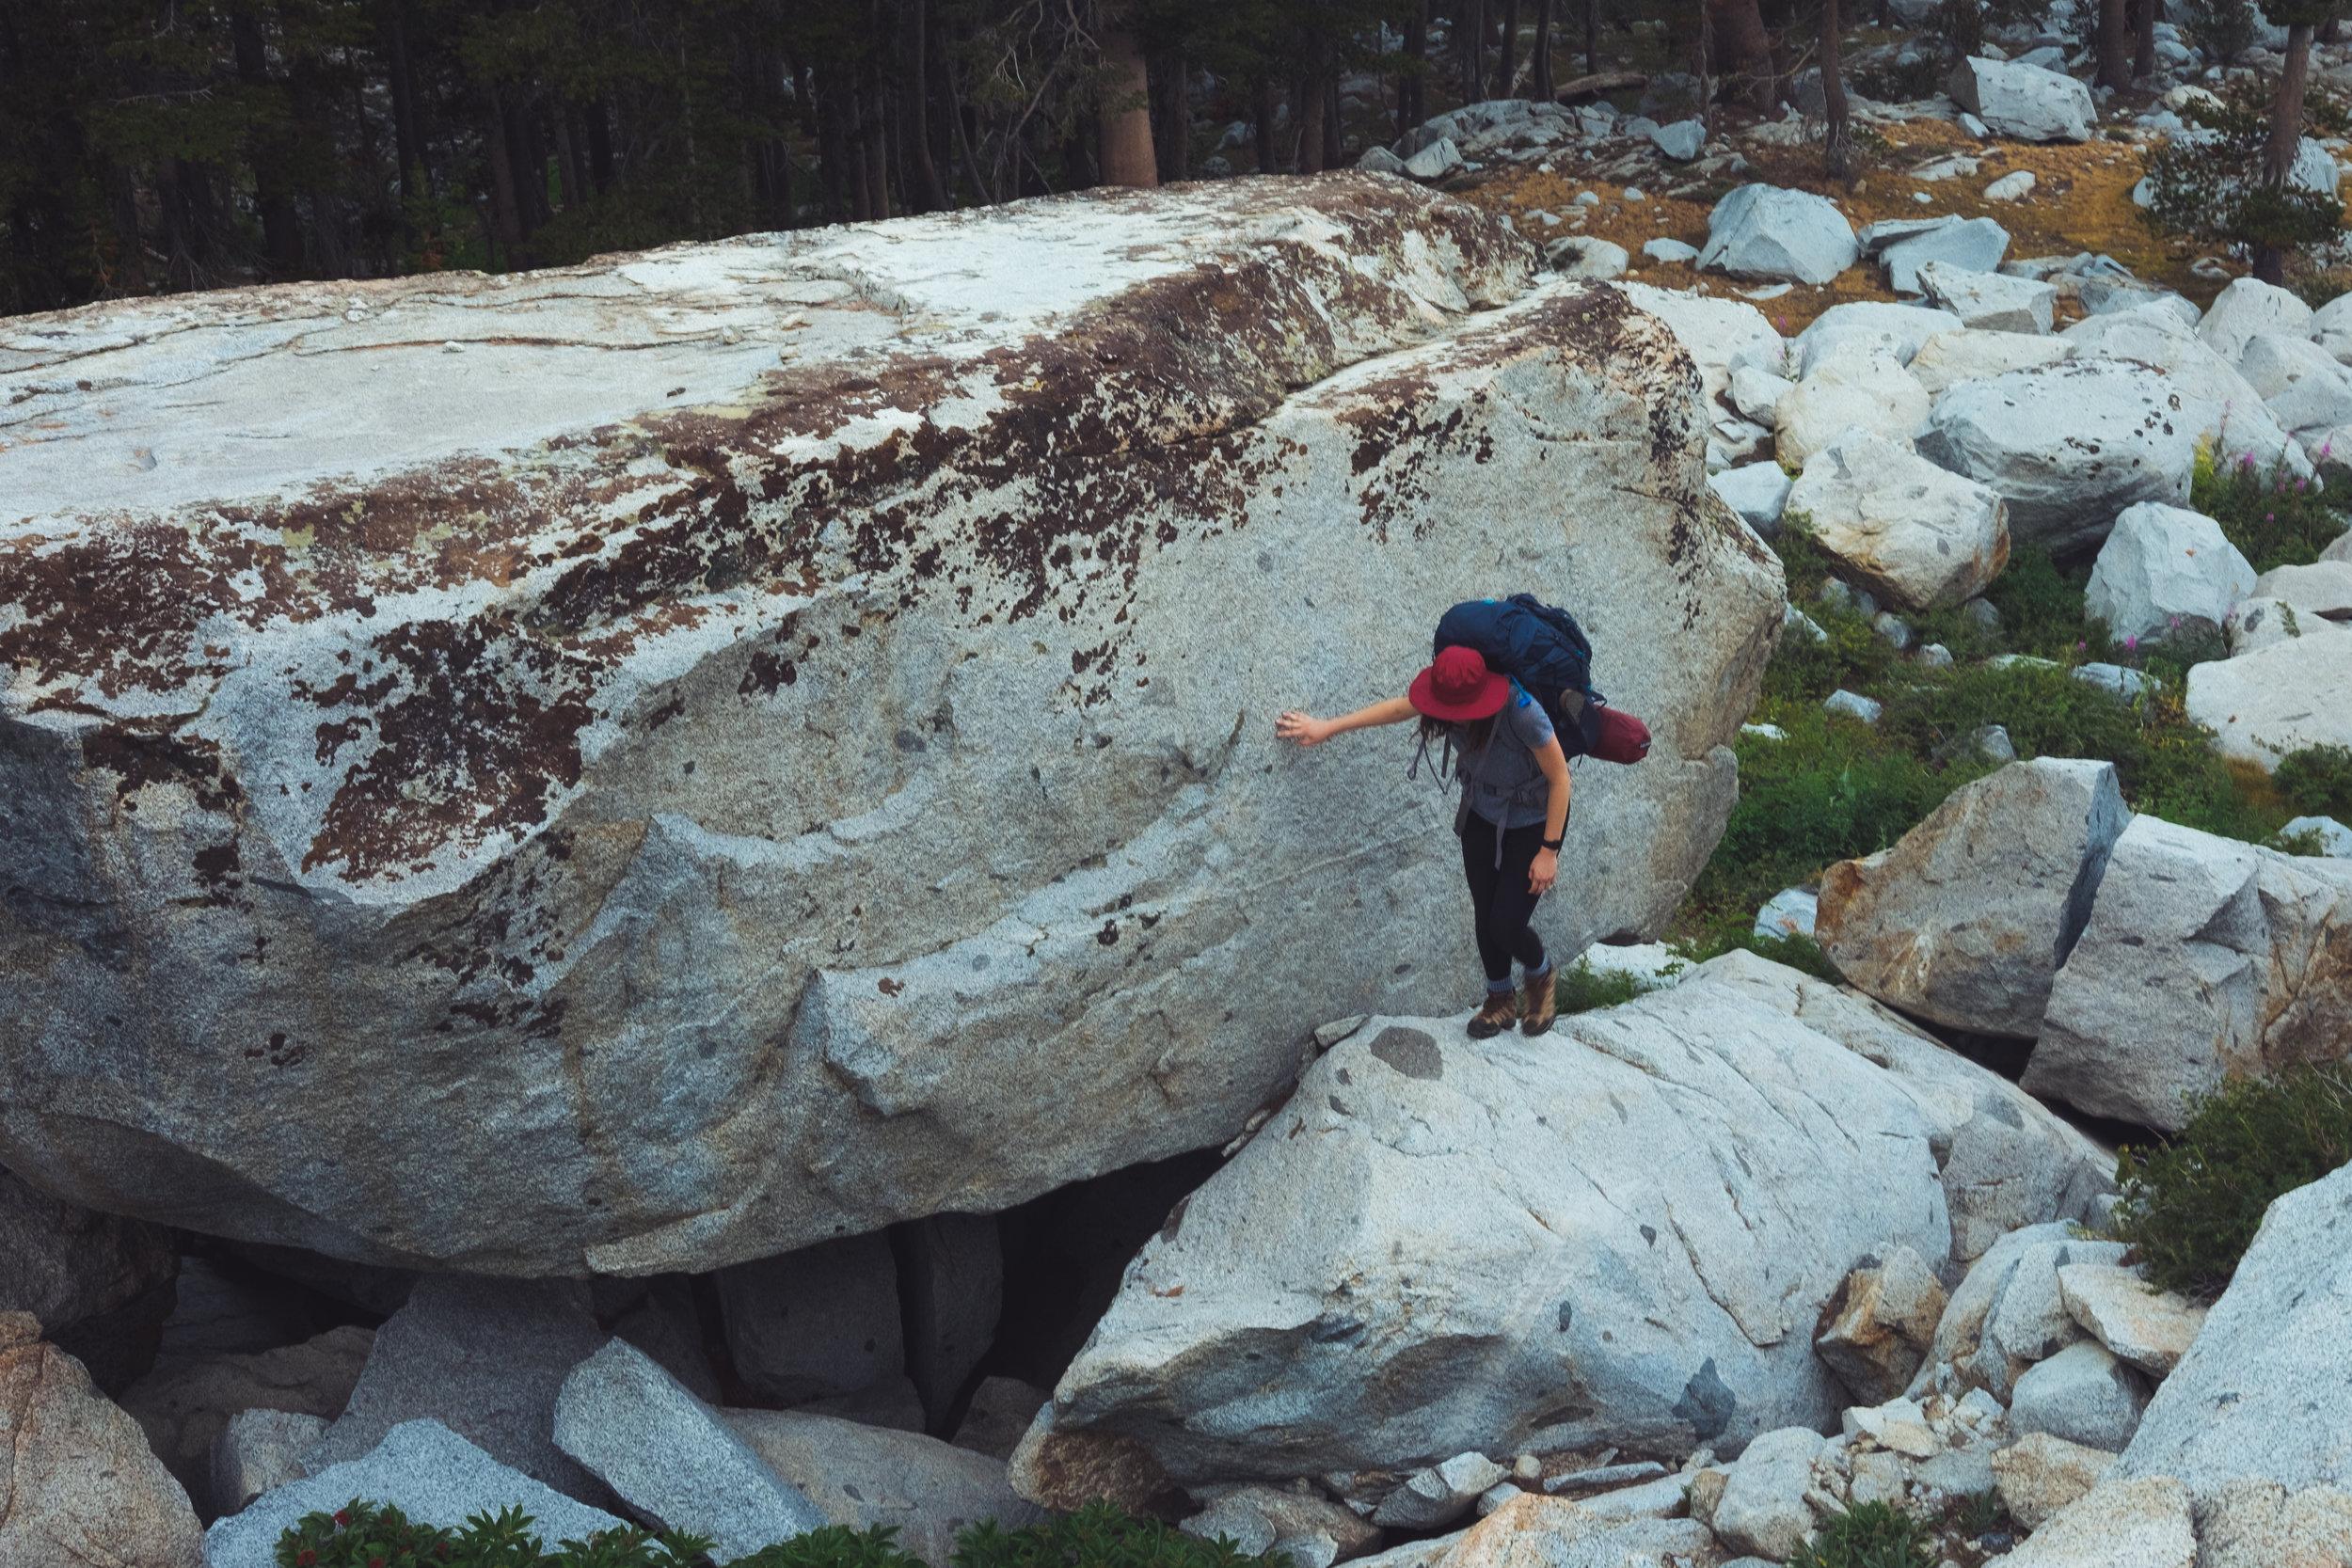 emily scrambling on some boulders